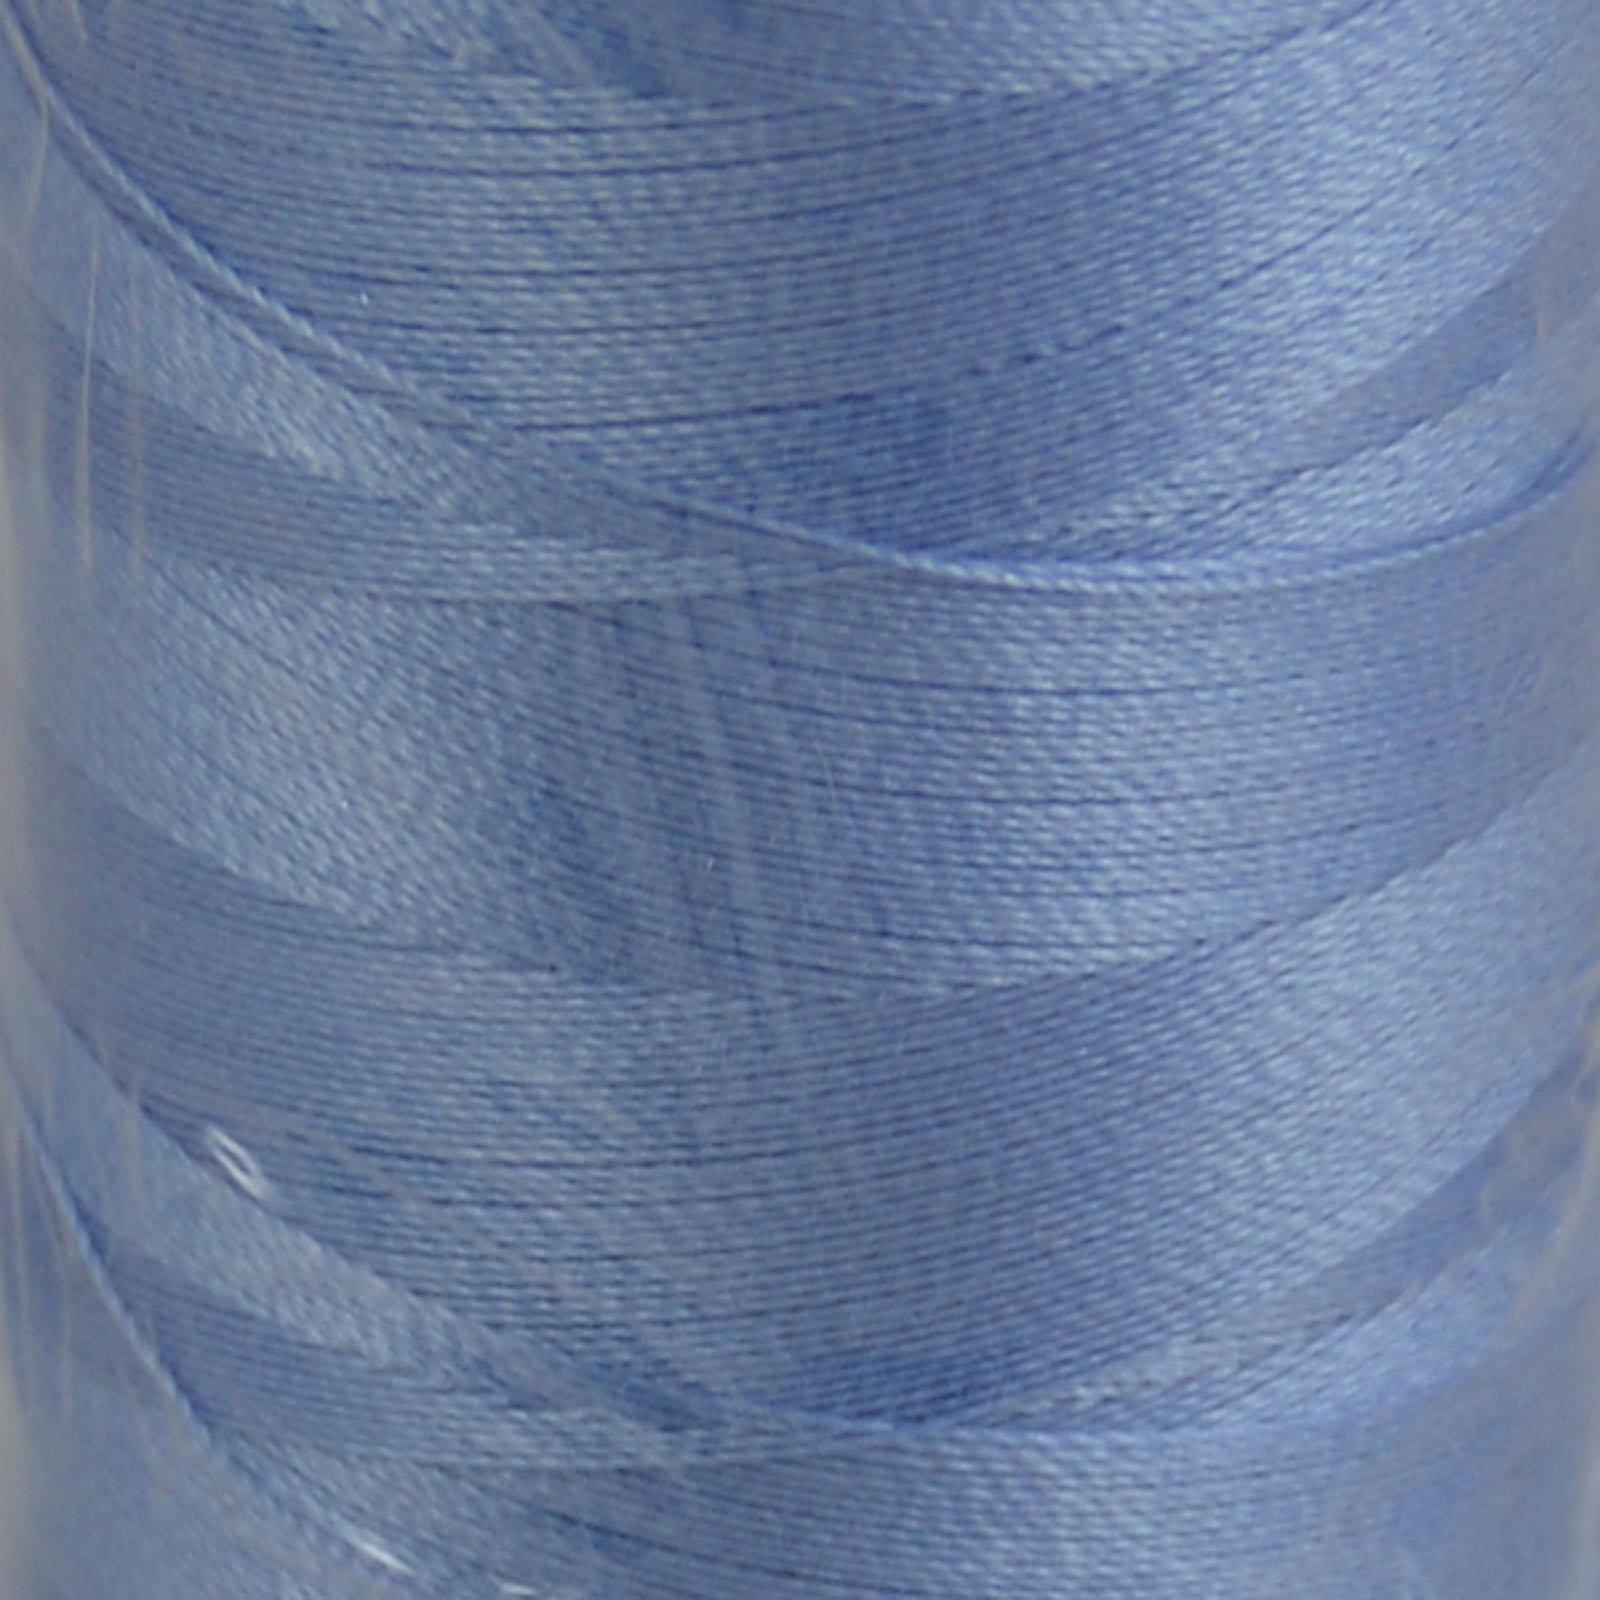 # 2720 Light Delft Blue